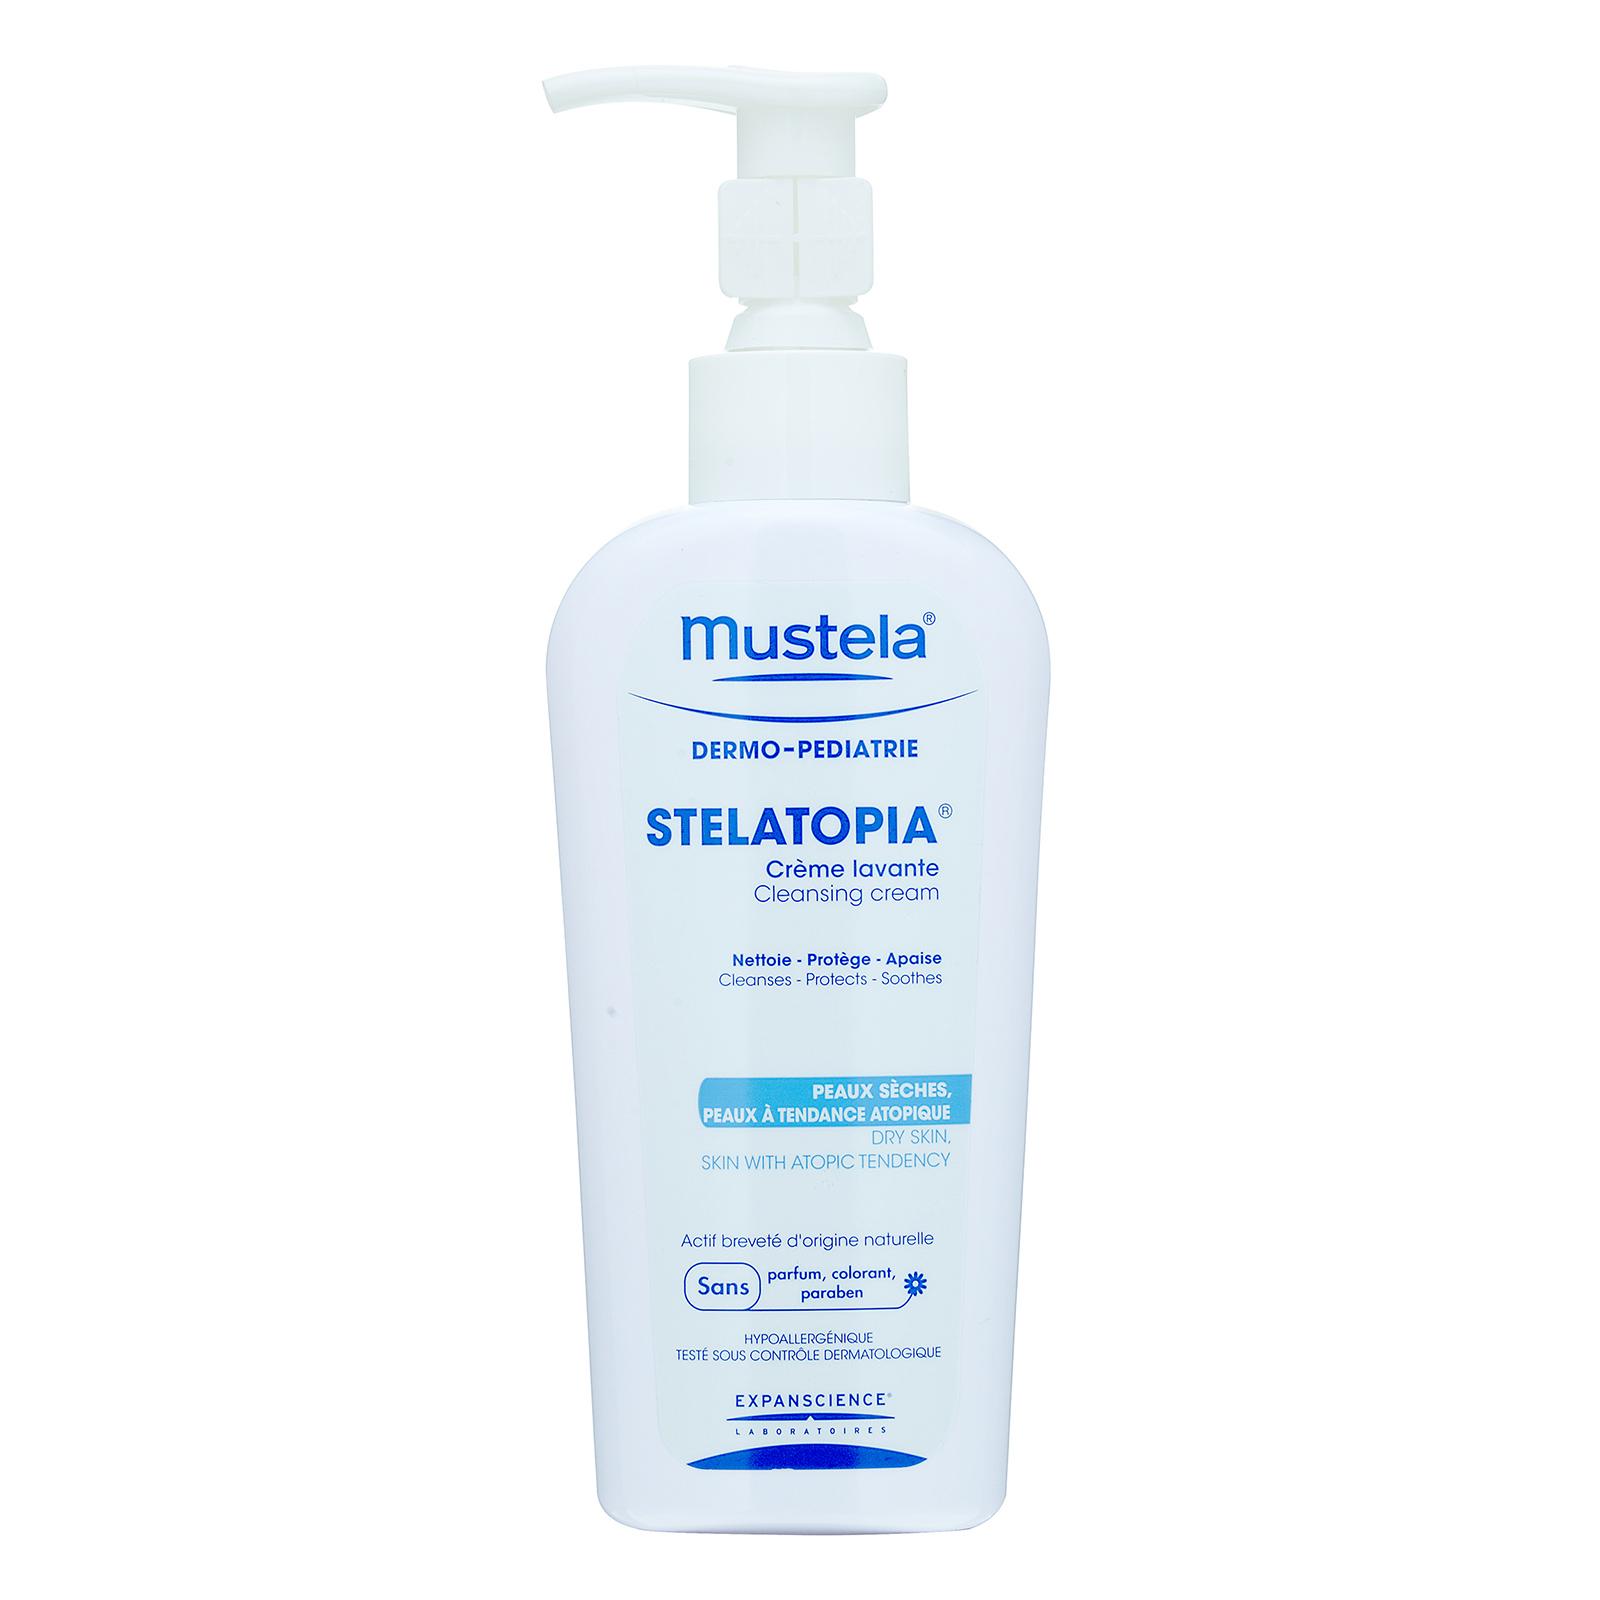 Mustela STELATOPIA  Cleansing Cream (Dry Skin - Skin With Atopic Tendency) 200ml,